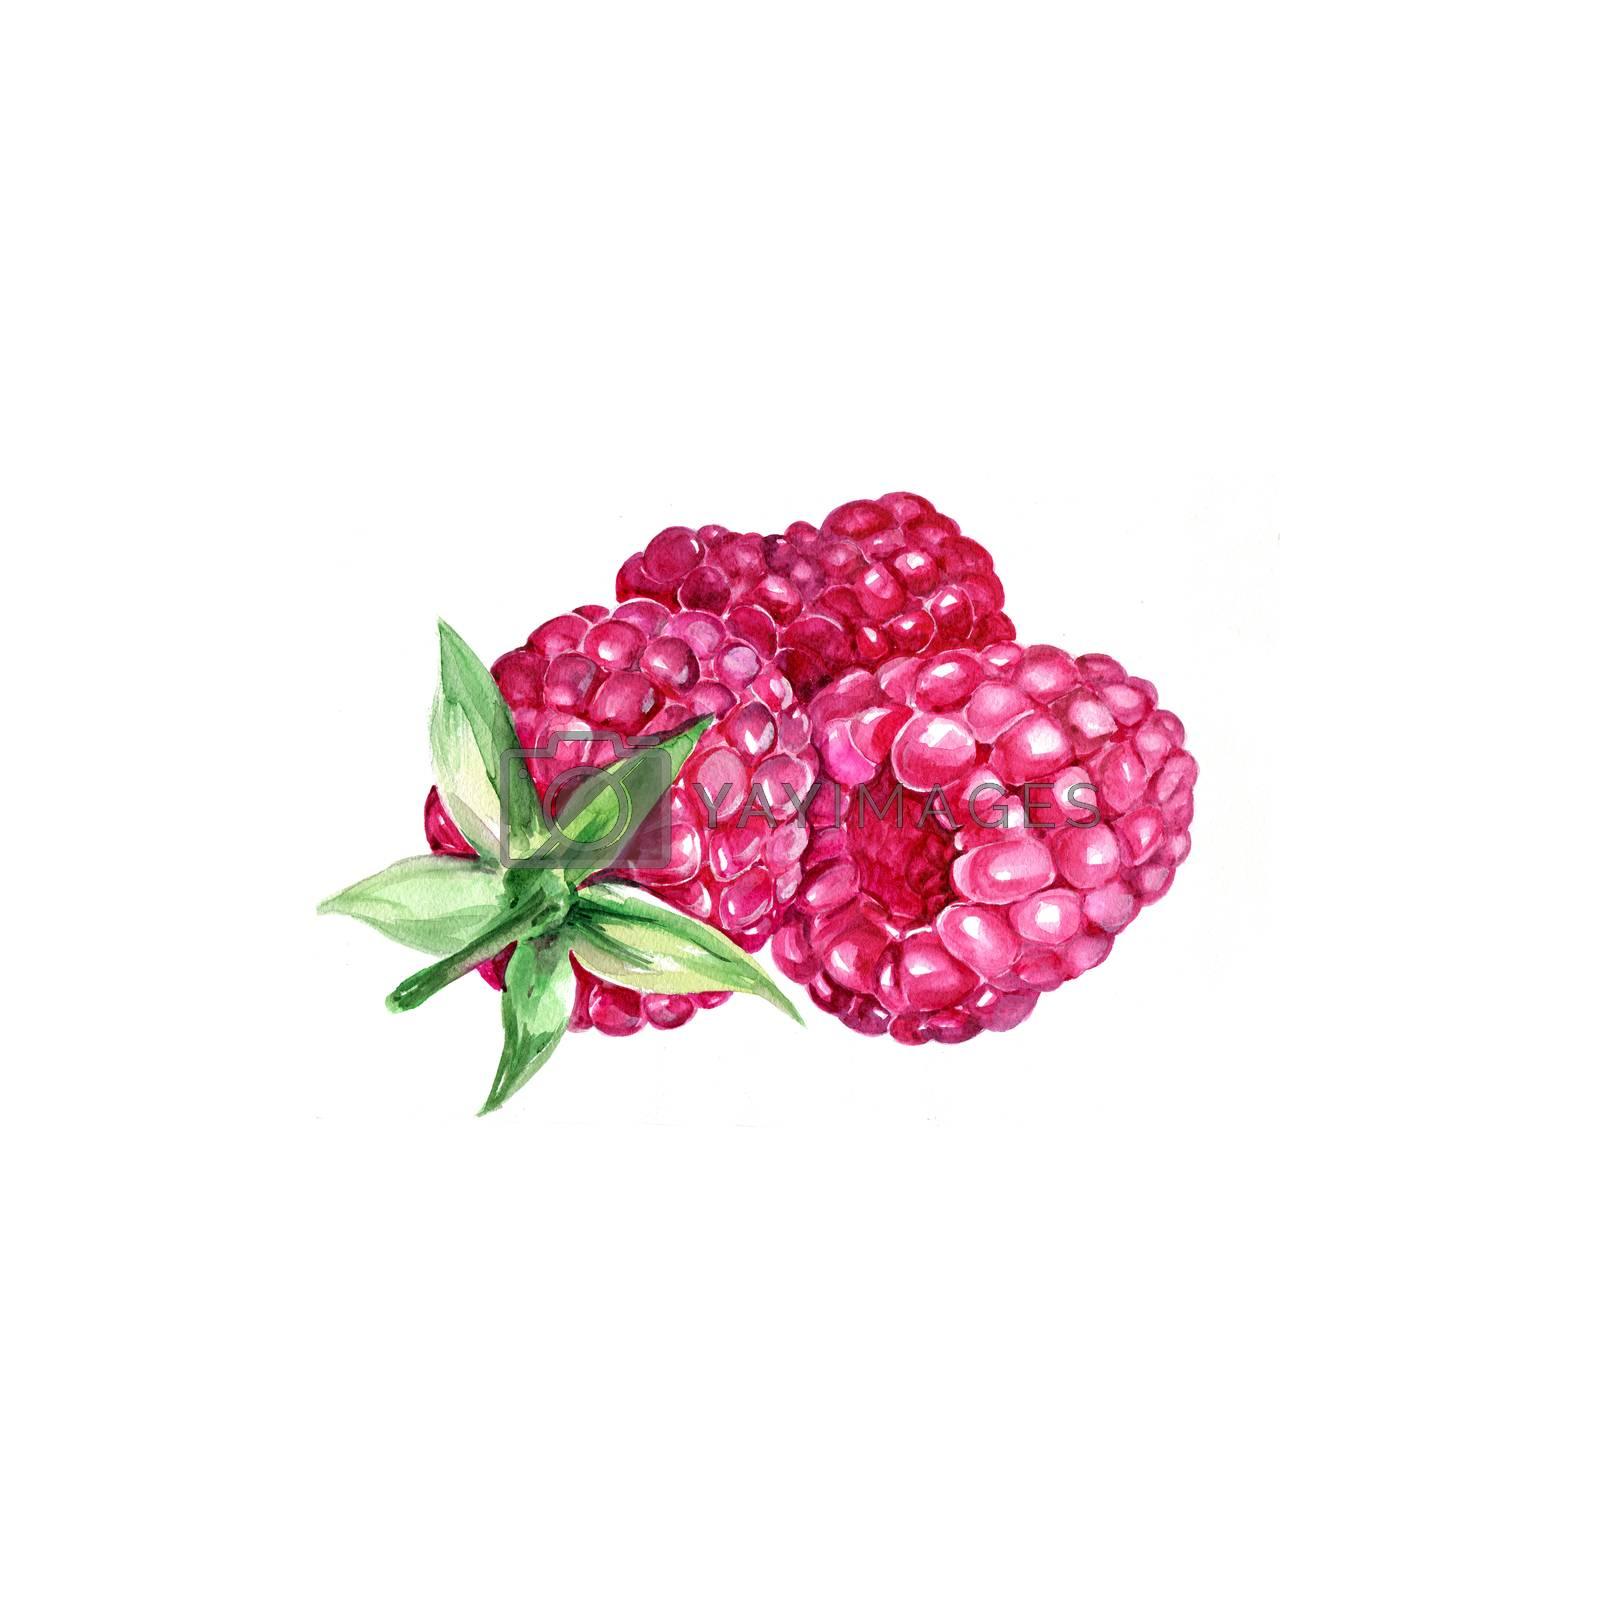 Watercolor Raspberry. Hand Drawn Illustration Organic Food Vegetarian Ingredient